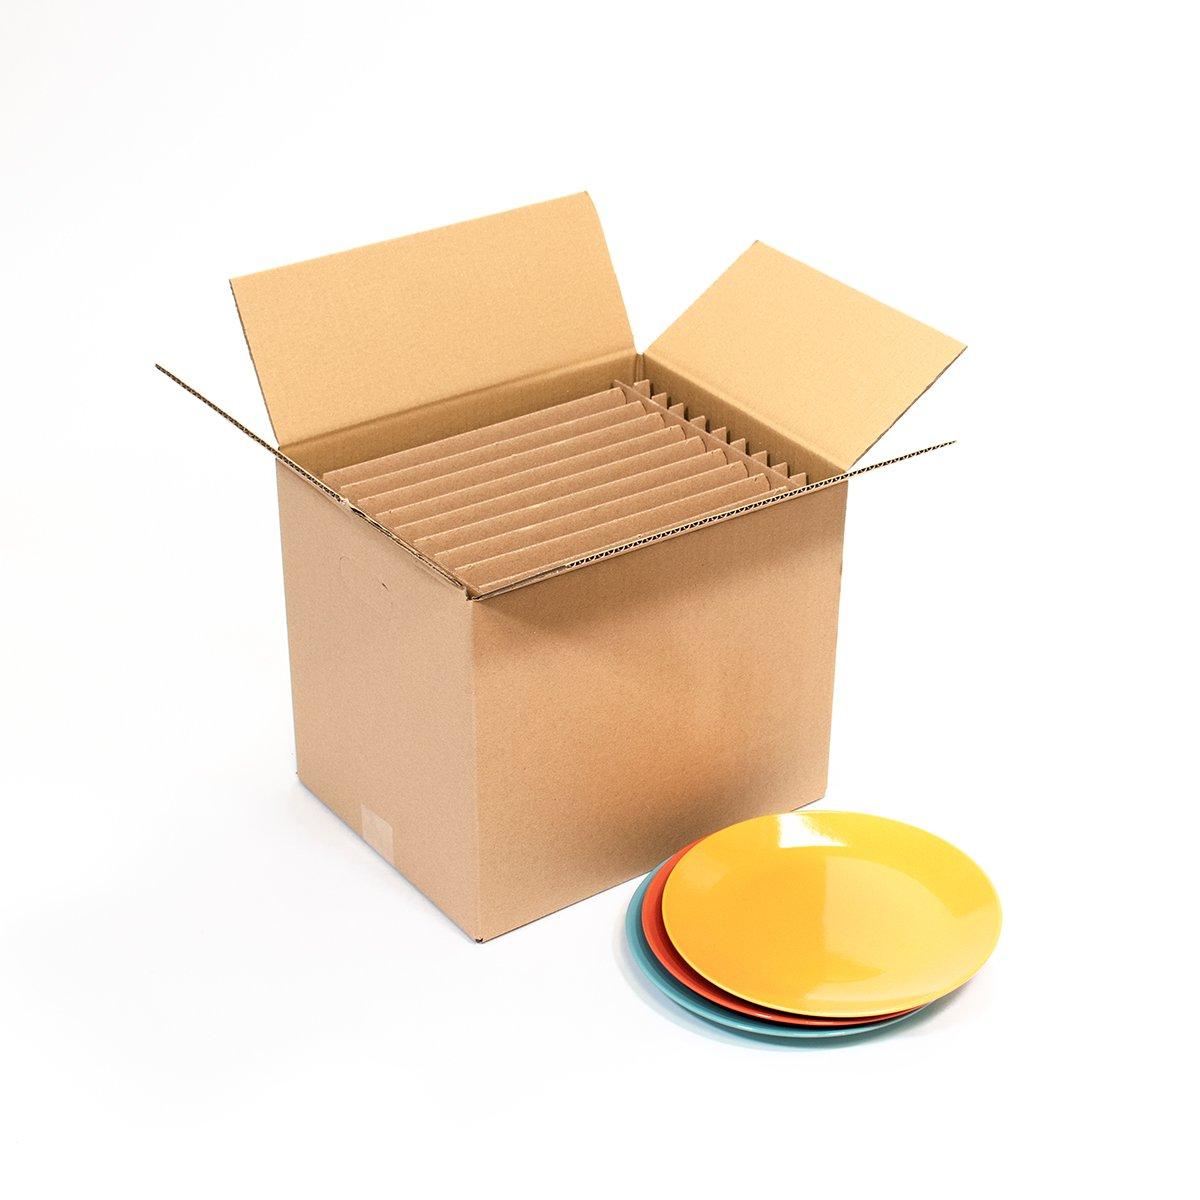 carton 12 assiettes 35x27 5x33cm carton market. Black Bedroom Furniture Sets. Home Design Ideas